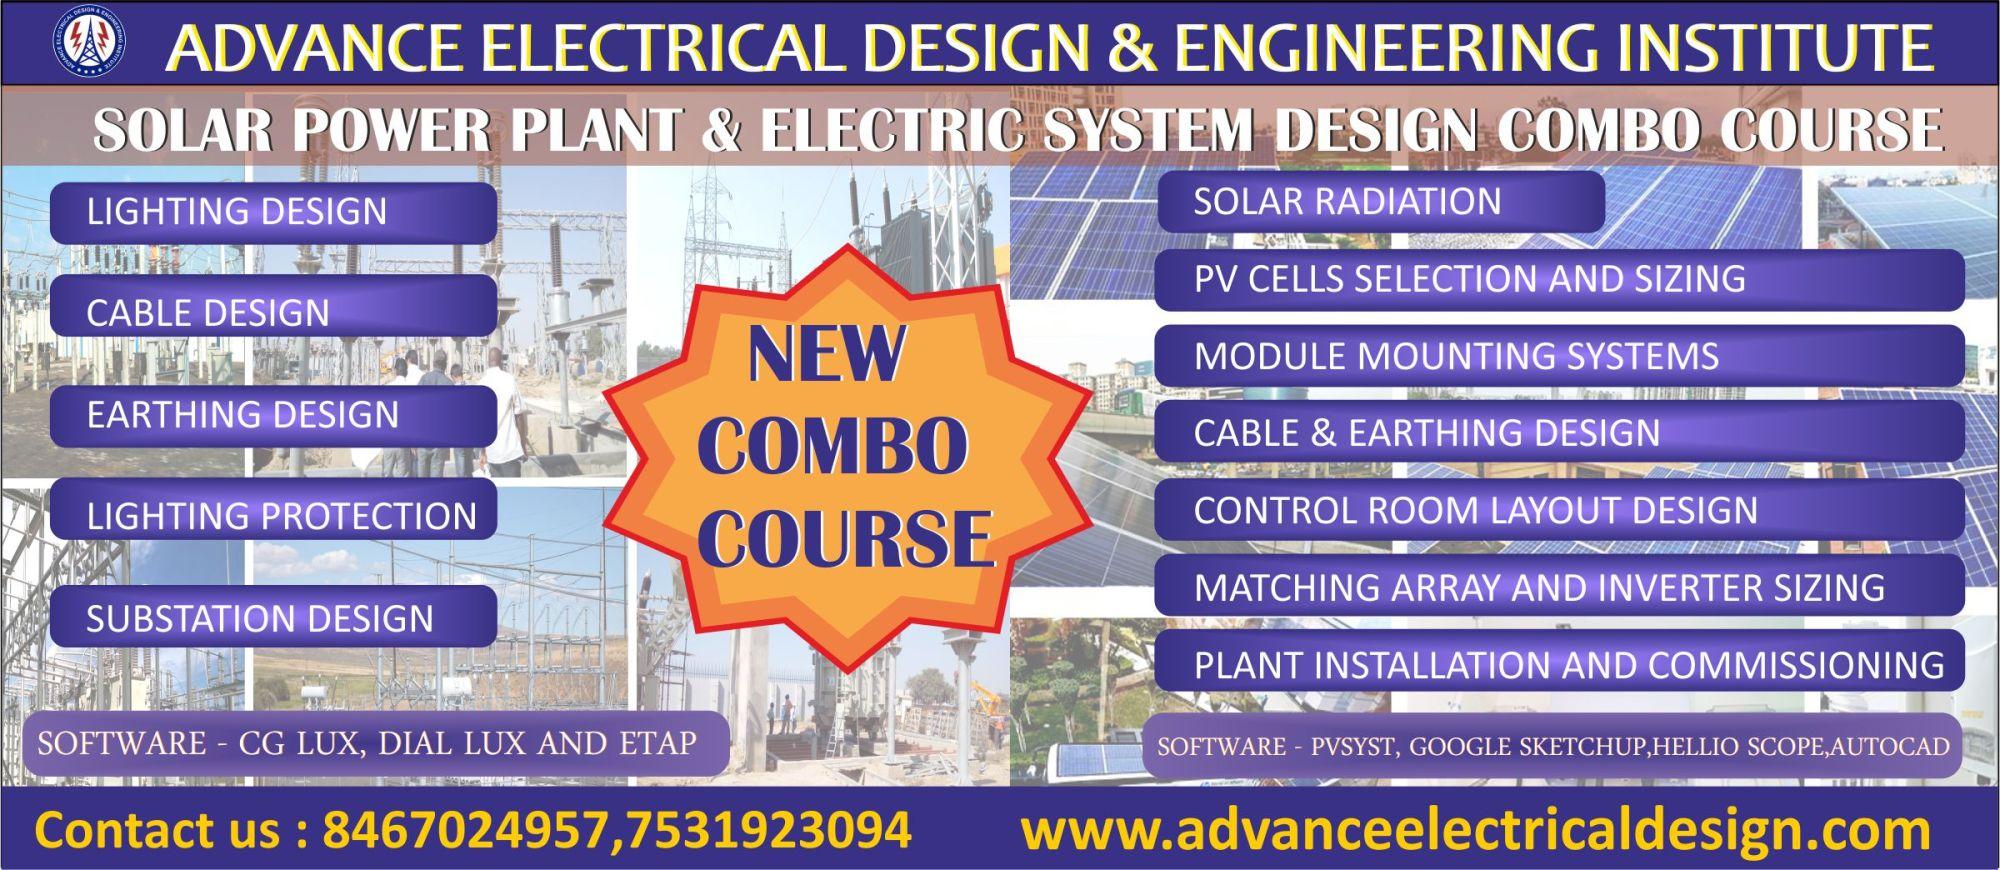 hight resolution of electrical solar design engineering course electrical system design course solar power plant design